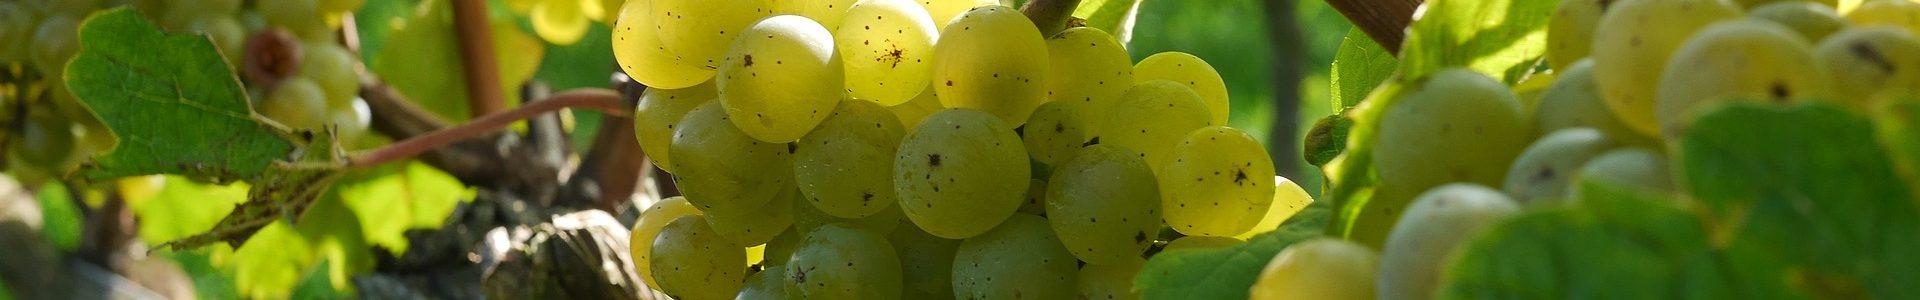 grapes 2104077 1920 1920x300 - Król Riesling – degustacja